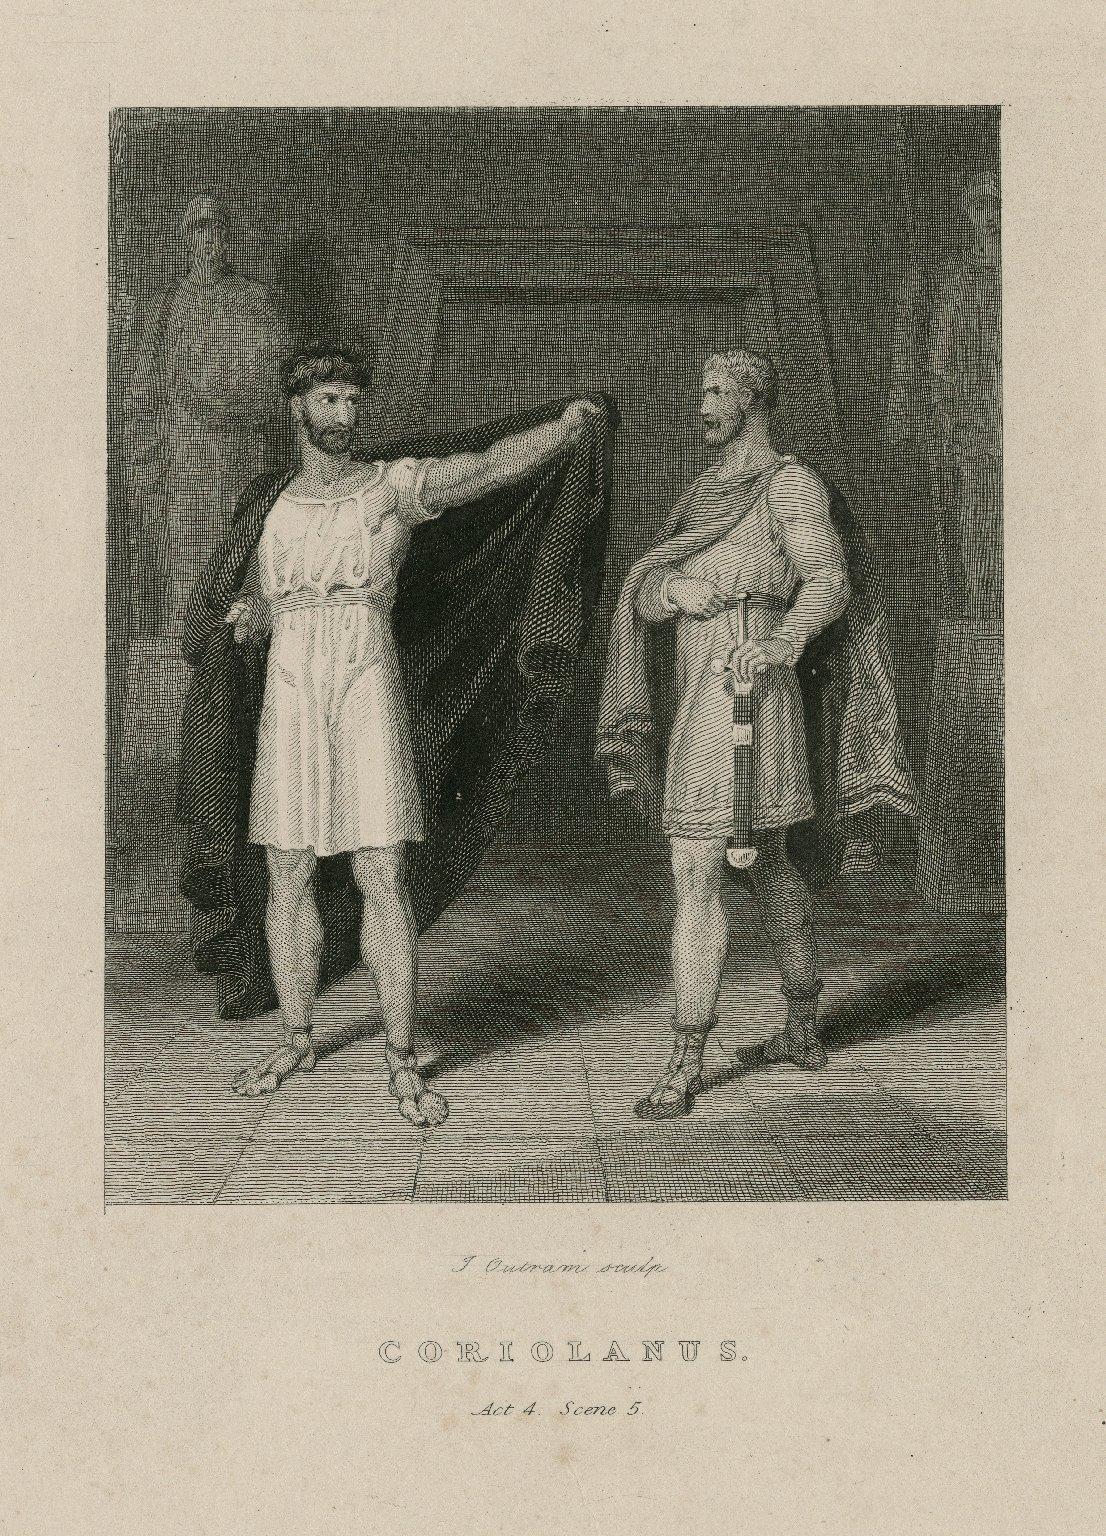 Coriolanus, act 4, scene 5 [graphic] / J. Outram, sculp.